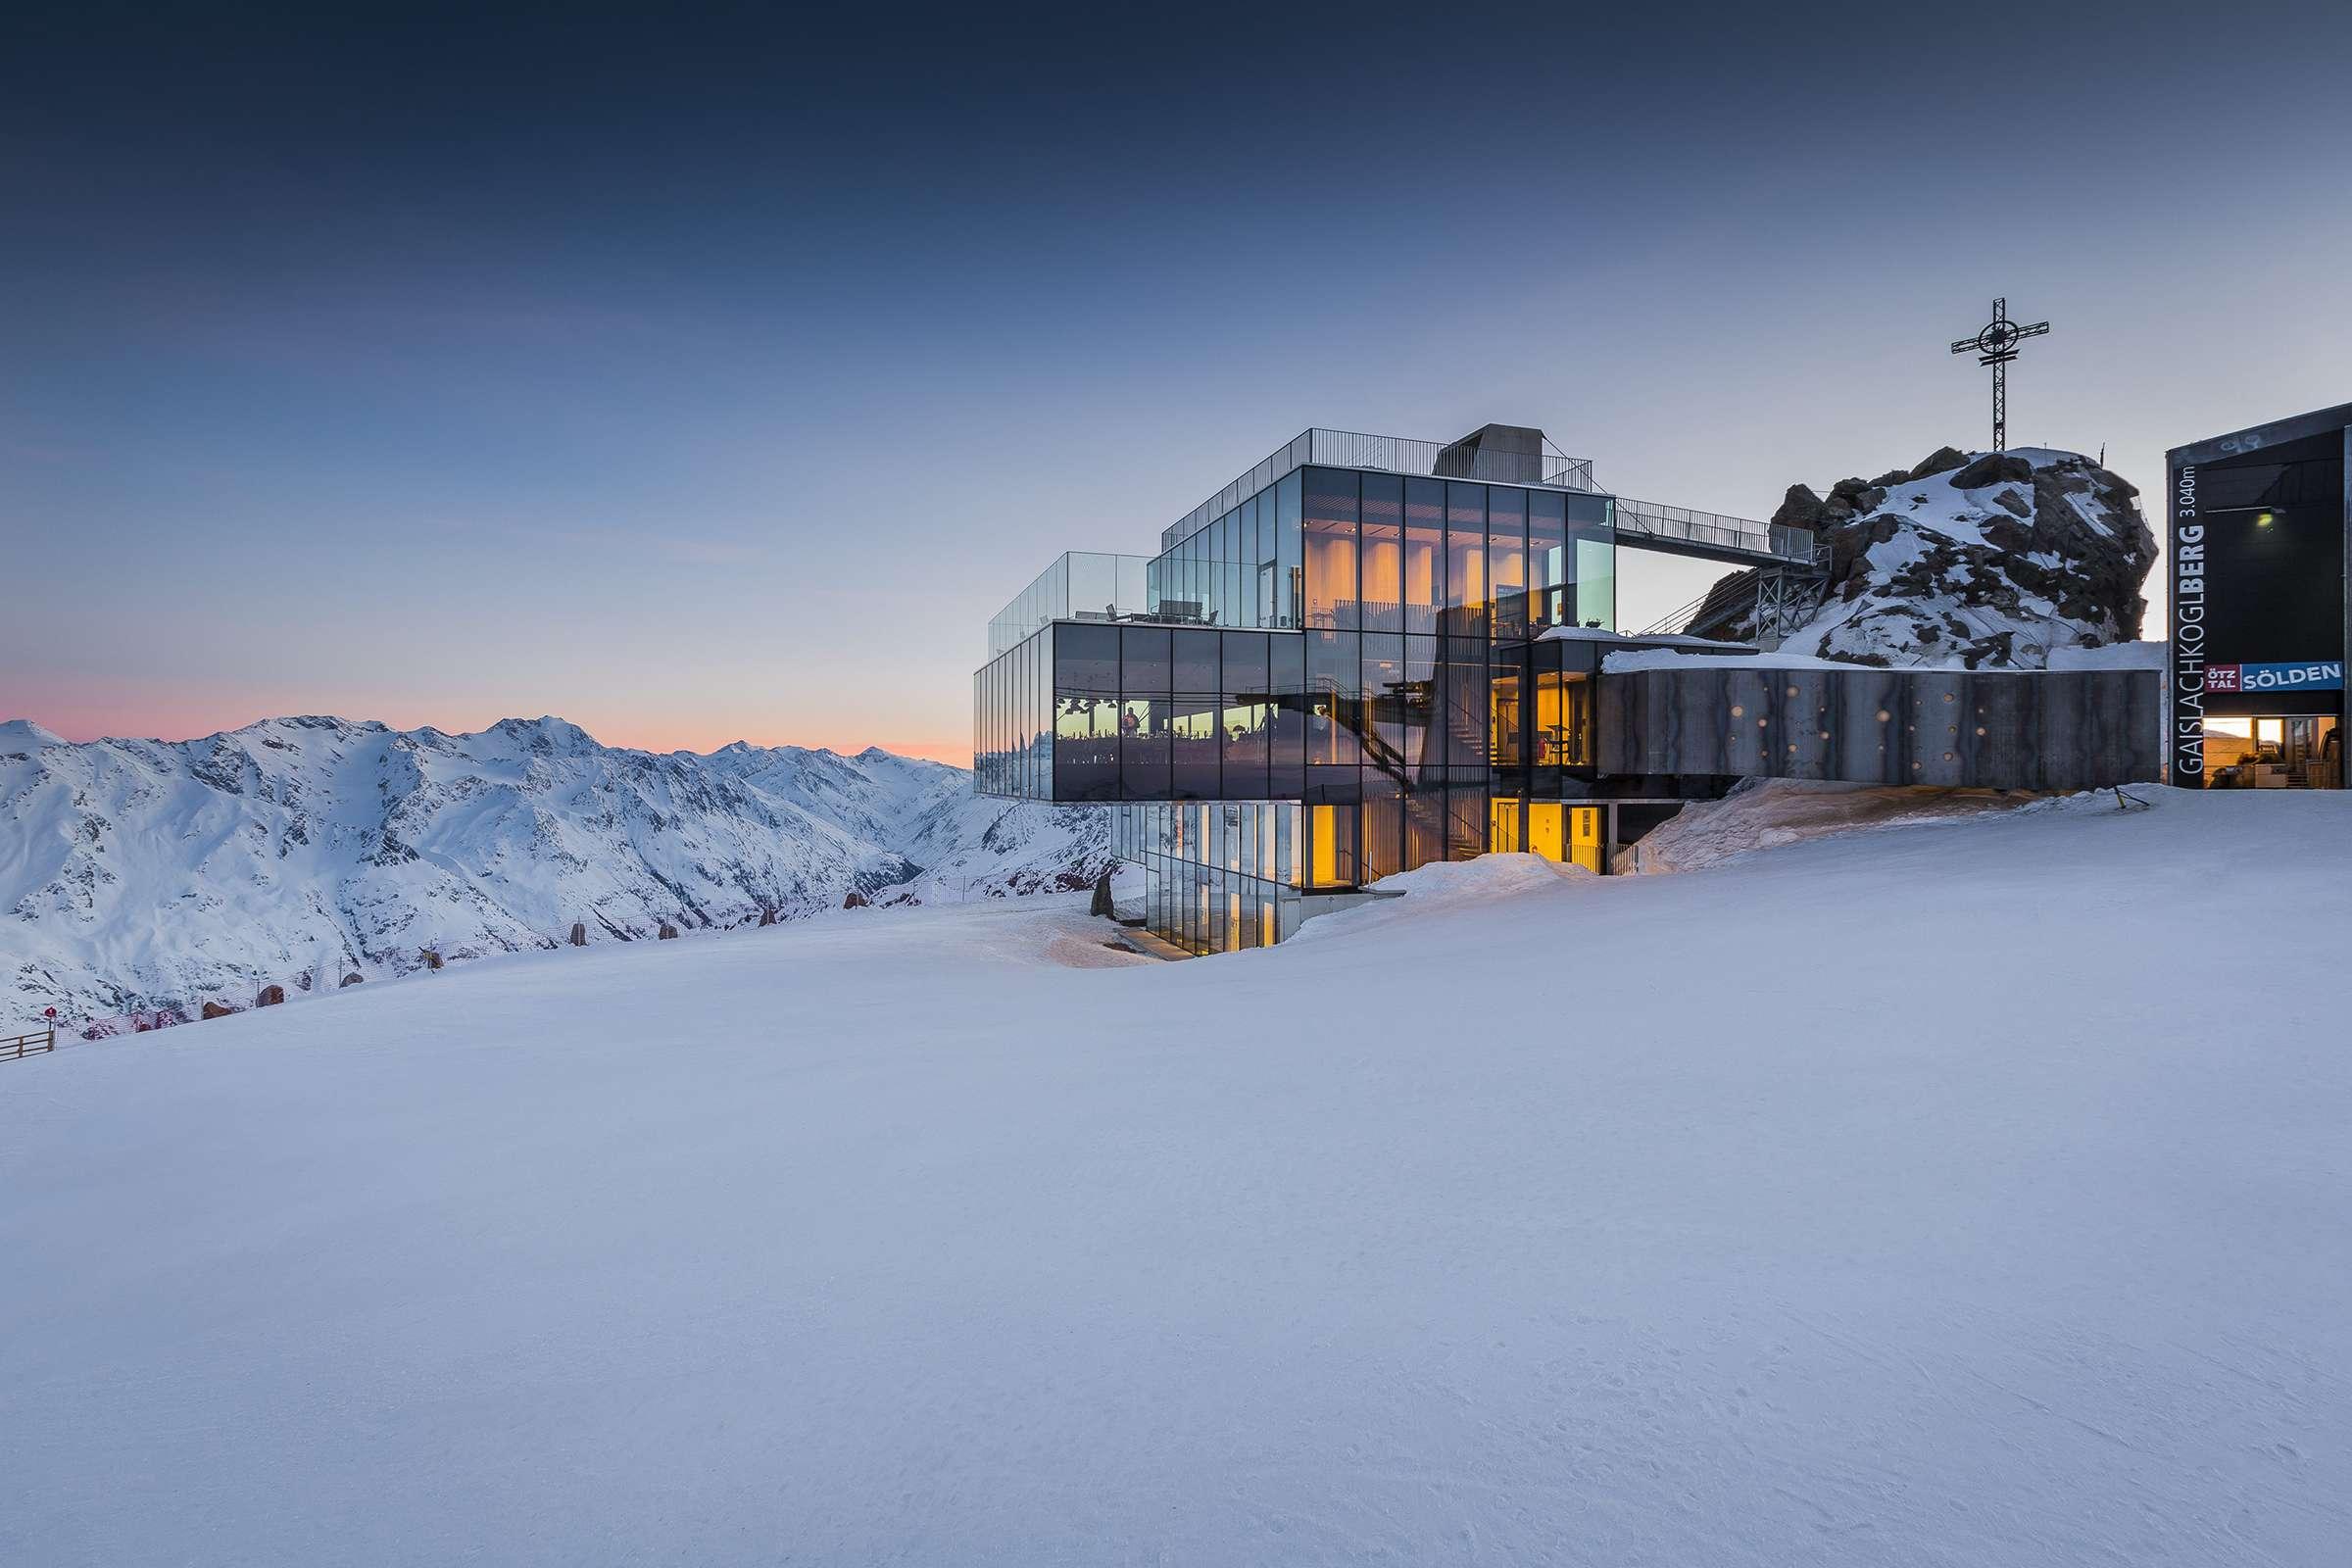 SPECTRE–cular! Secret Mission In The Ötztal Alps